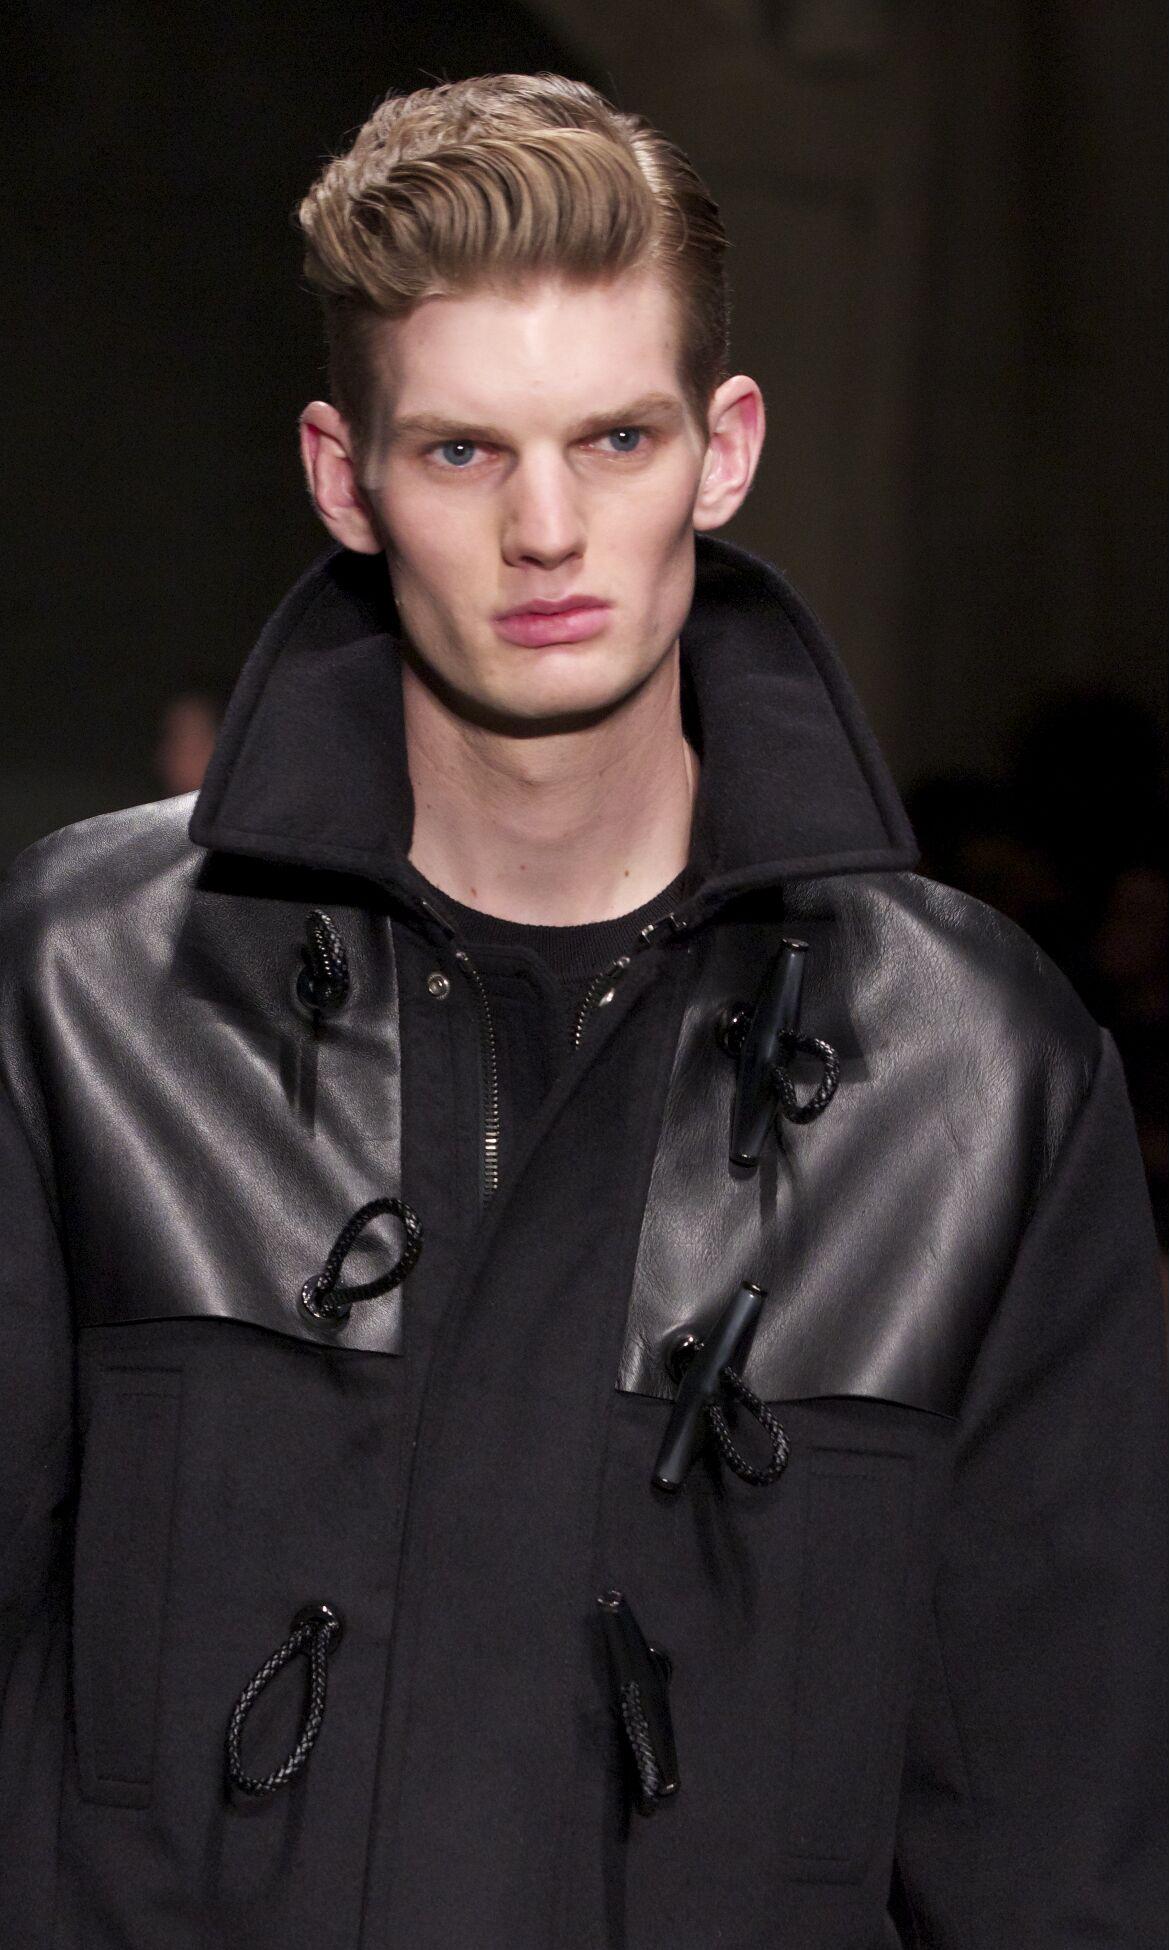 Joseph Abboud Fall Winter 2013 14 Men Collection Pitti Uomo Fashion Show